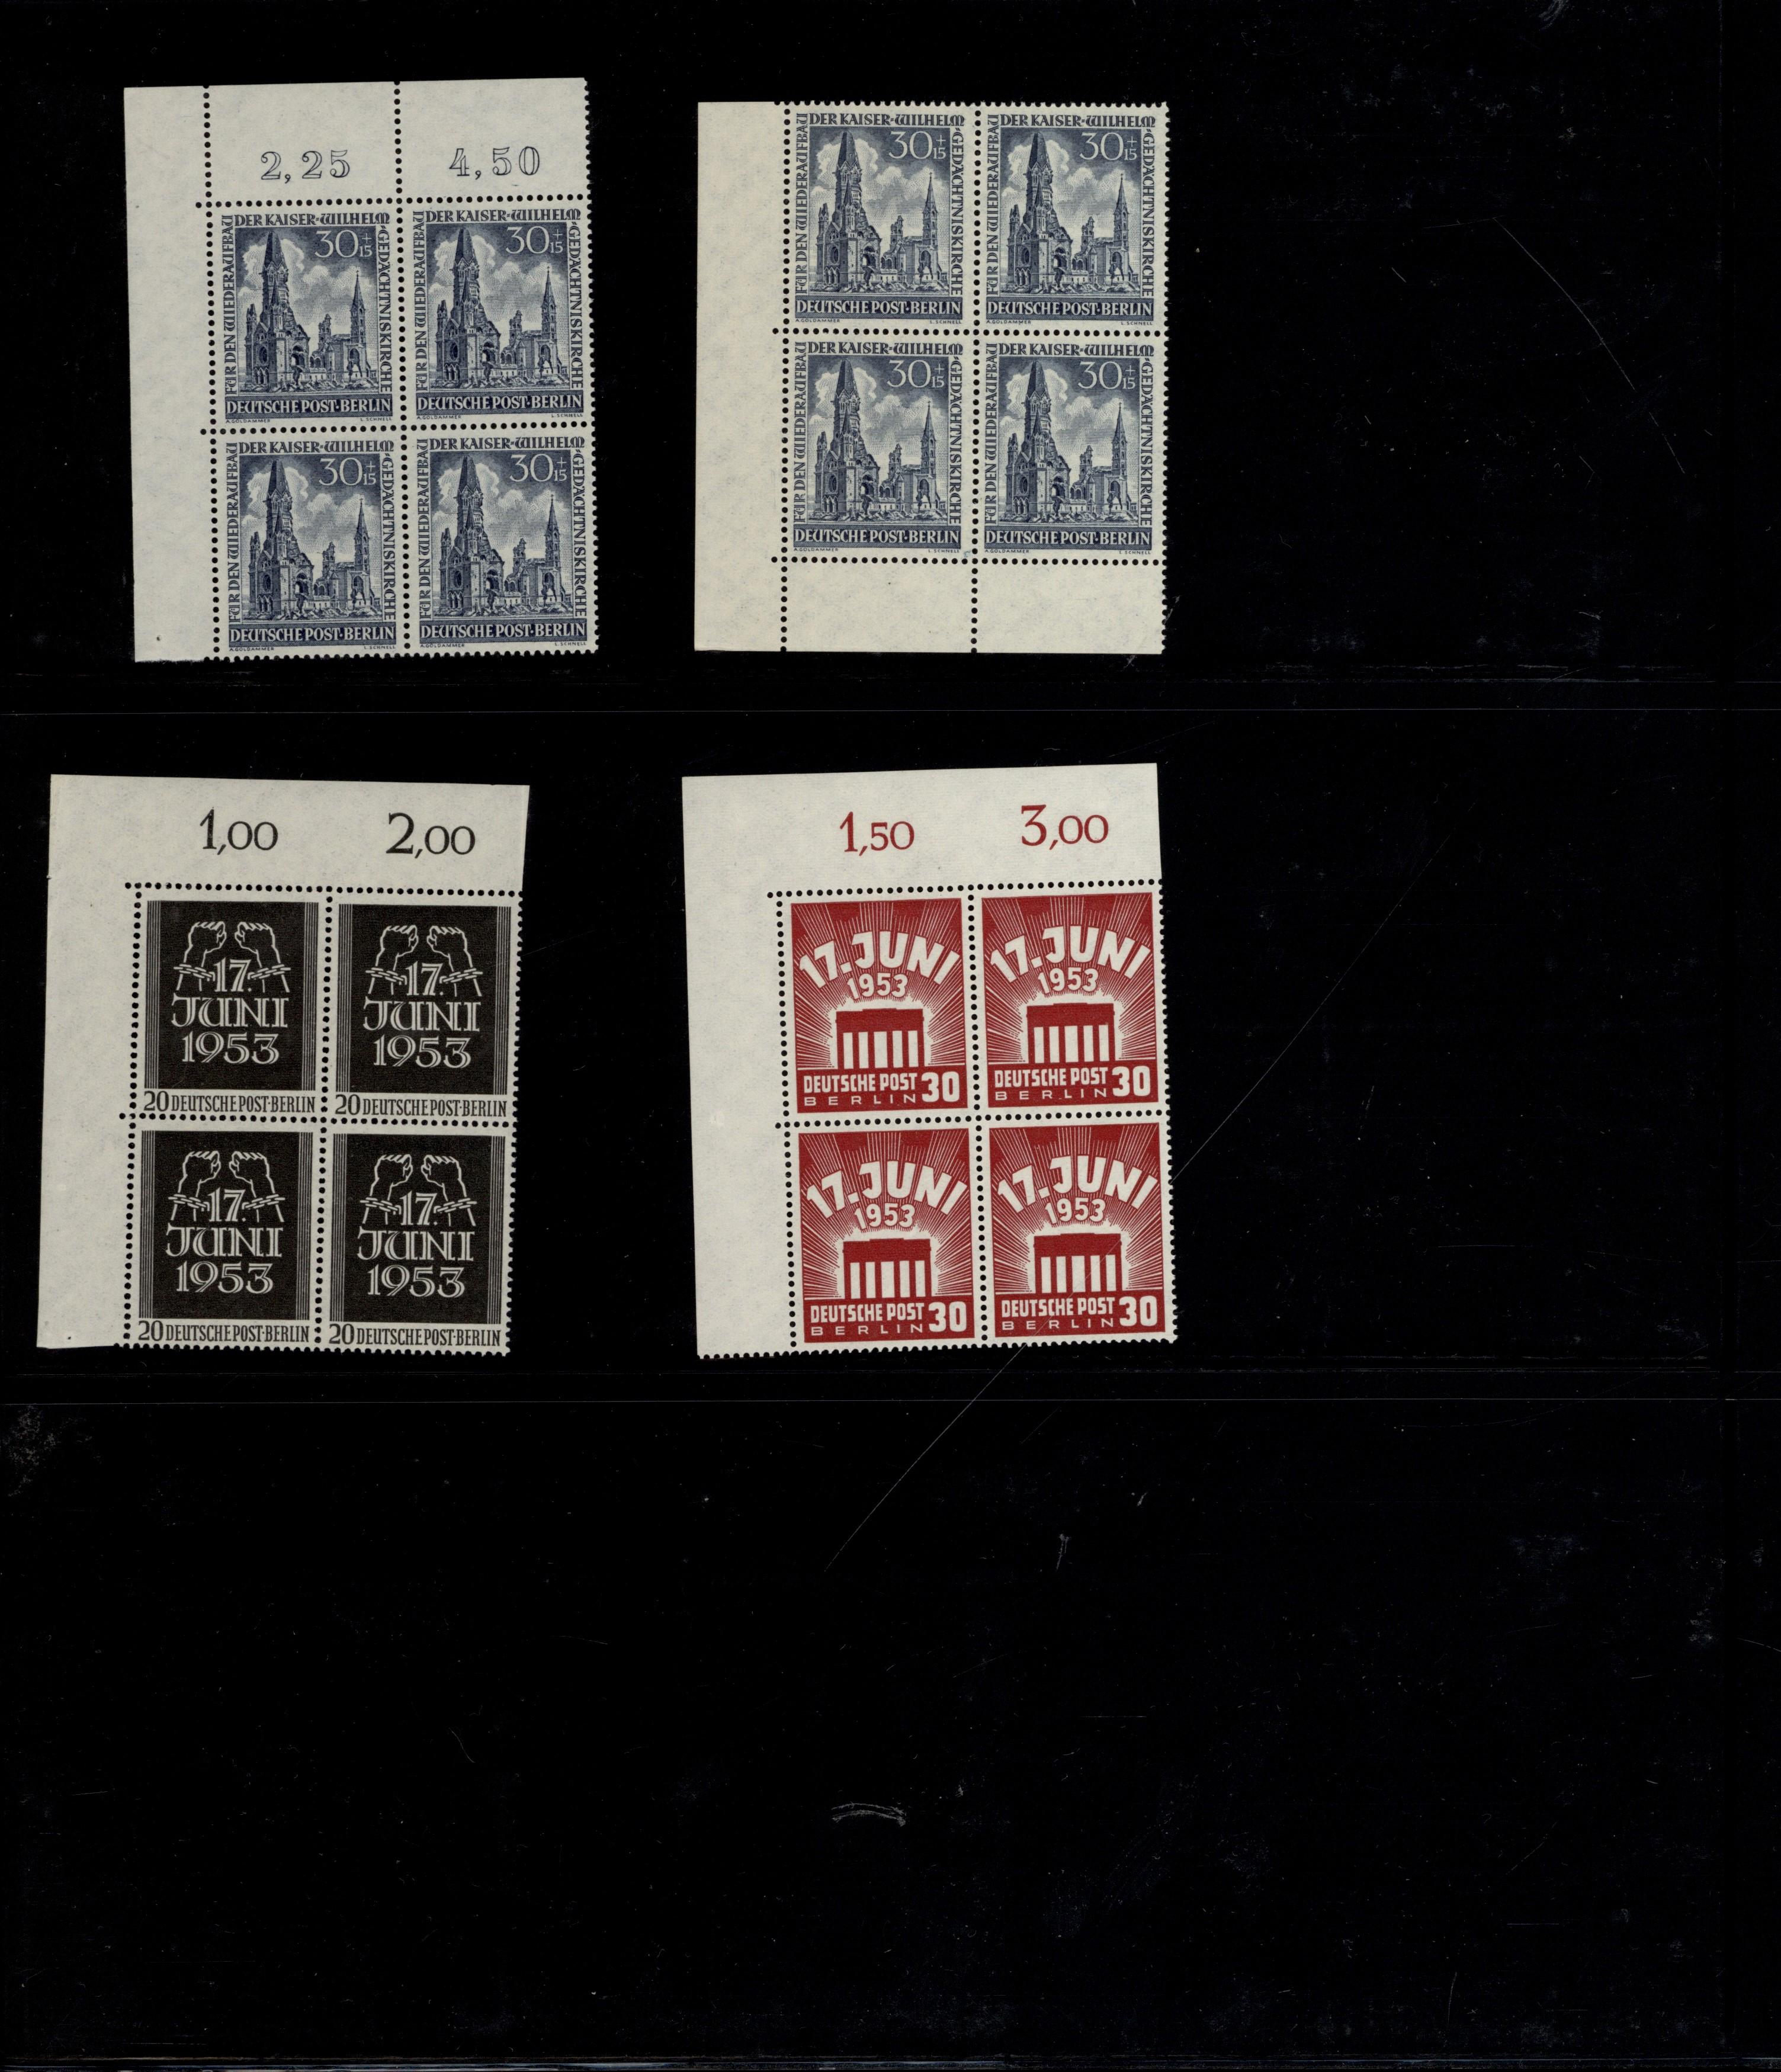 Lot 38094 - bundesrepublik und berlin  -  Auktionshaus Christoph Gärtner GmbH & Co. KG Collections Germany,  Collections Supplement, Surprise boxes #39 Day 7